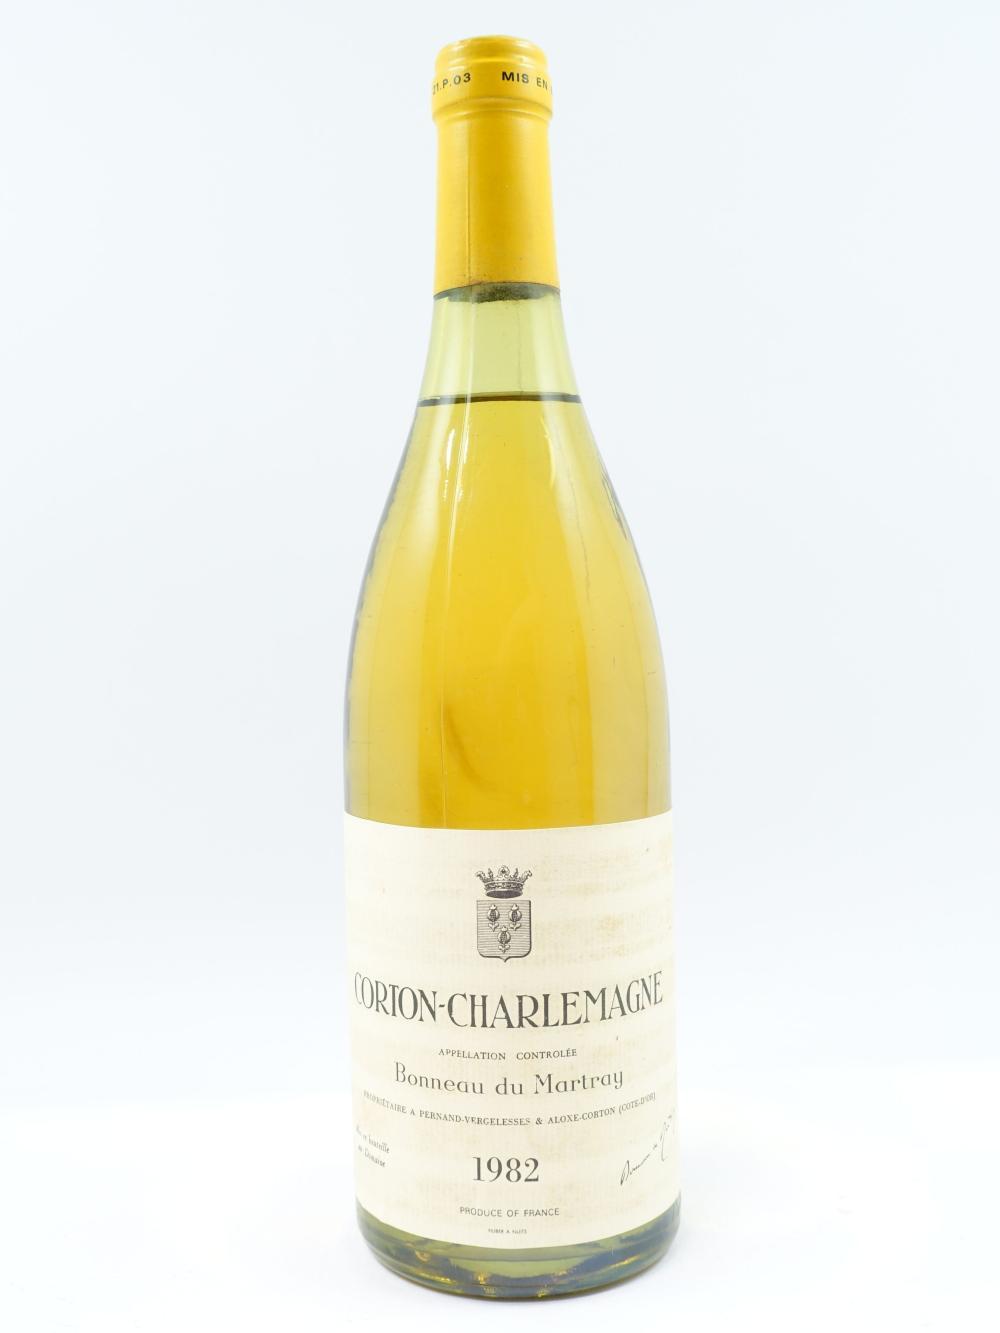 1 bouteille CORTON CHARLEMAGNE 1982 Grand Cru